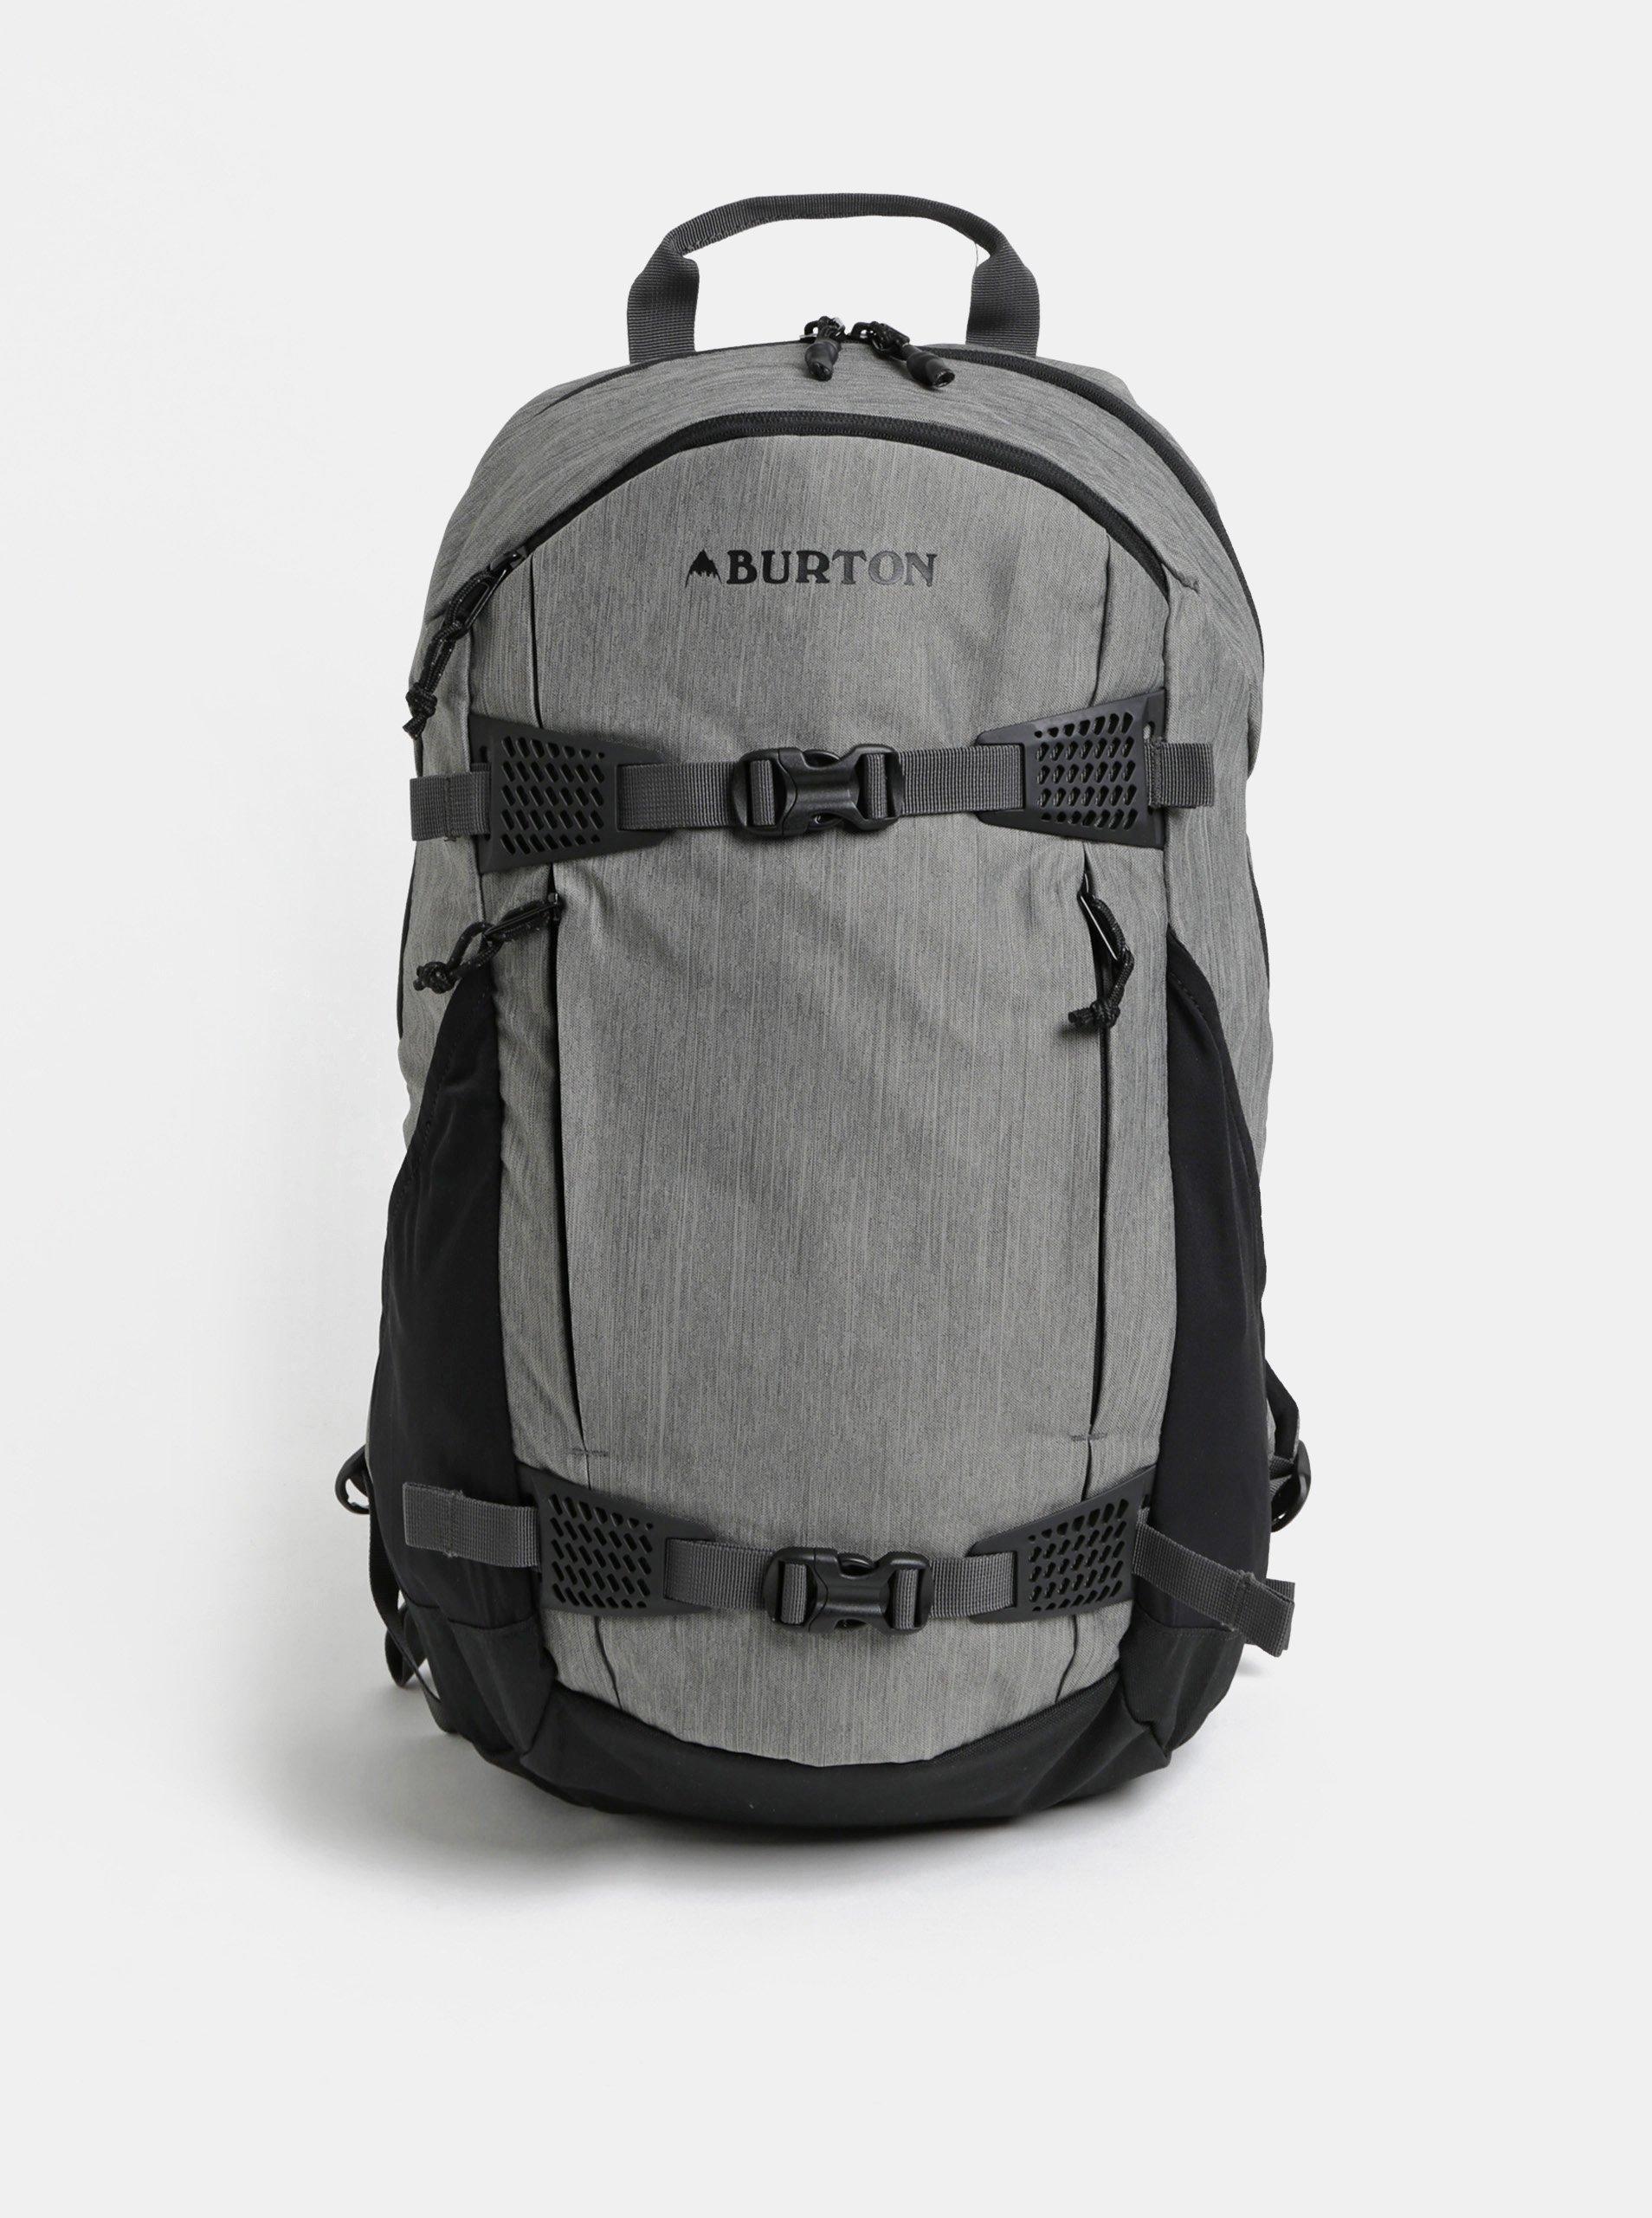 3c7d147ee4 Čierno-sivý melírovaný batoh Burton 25 l